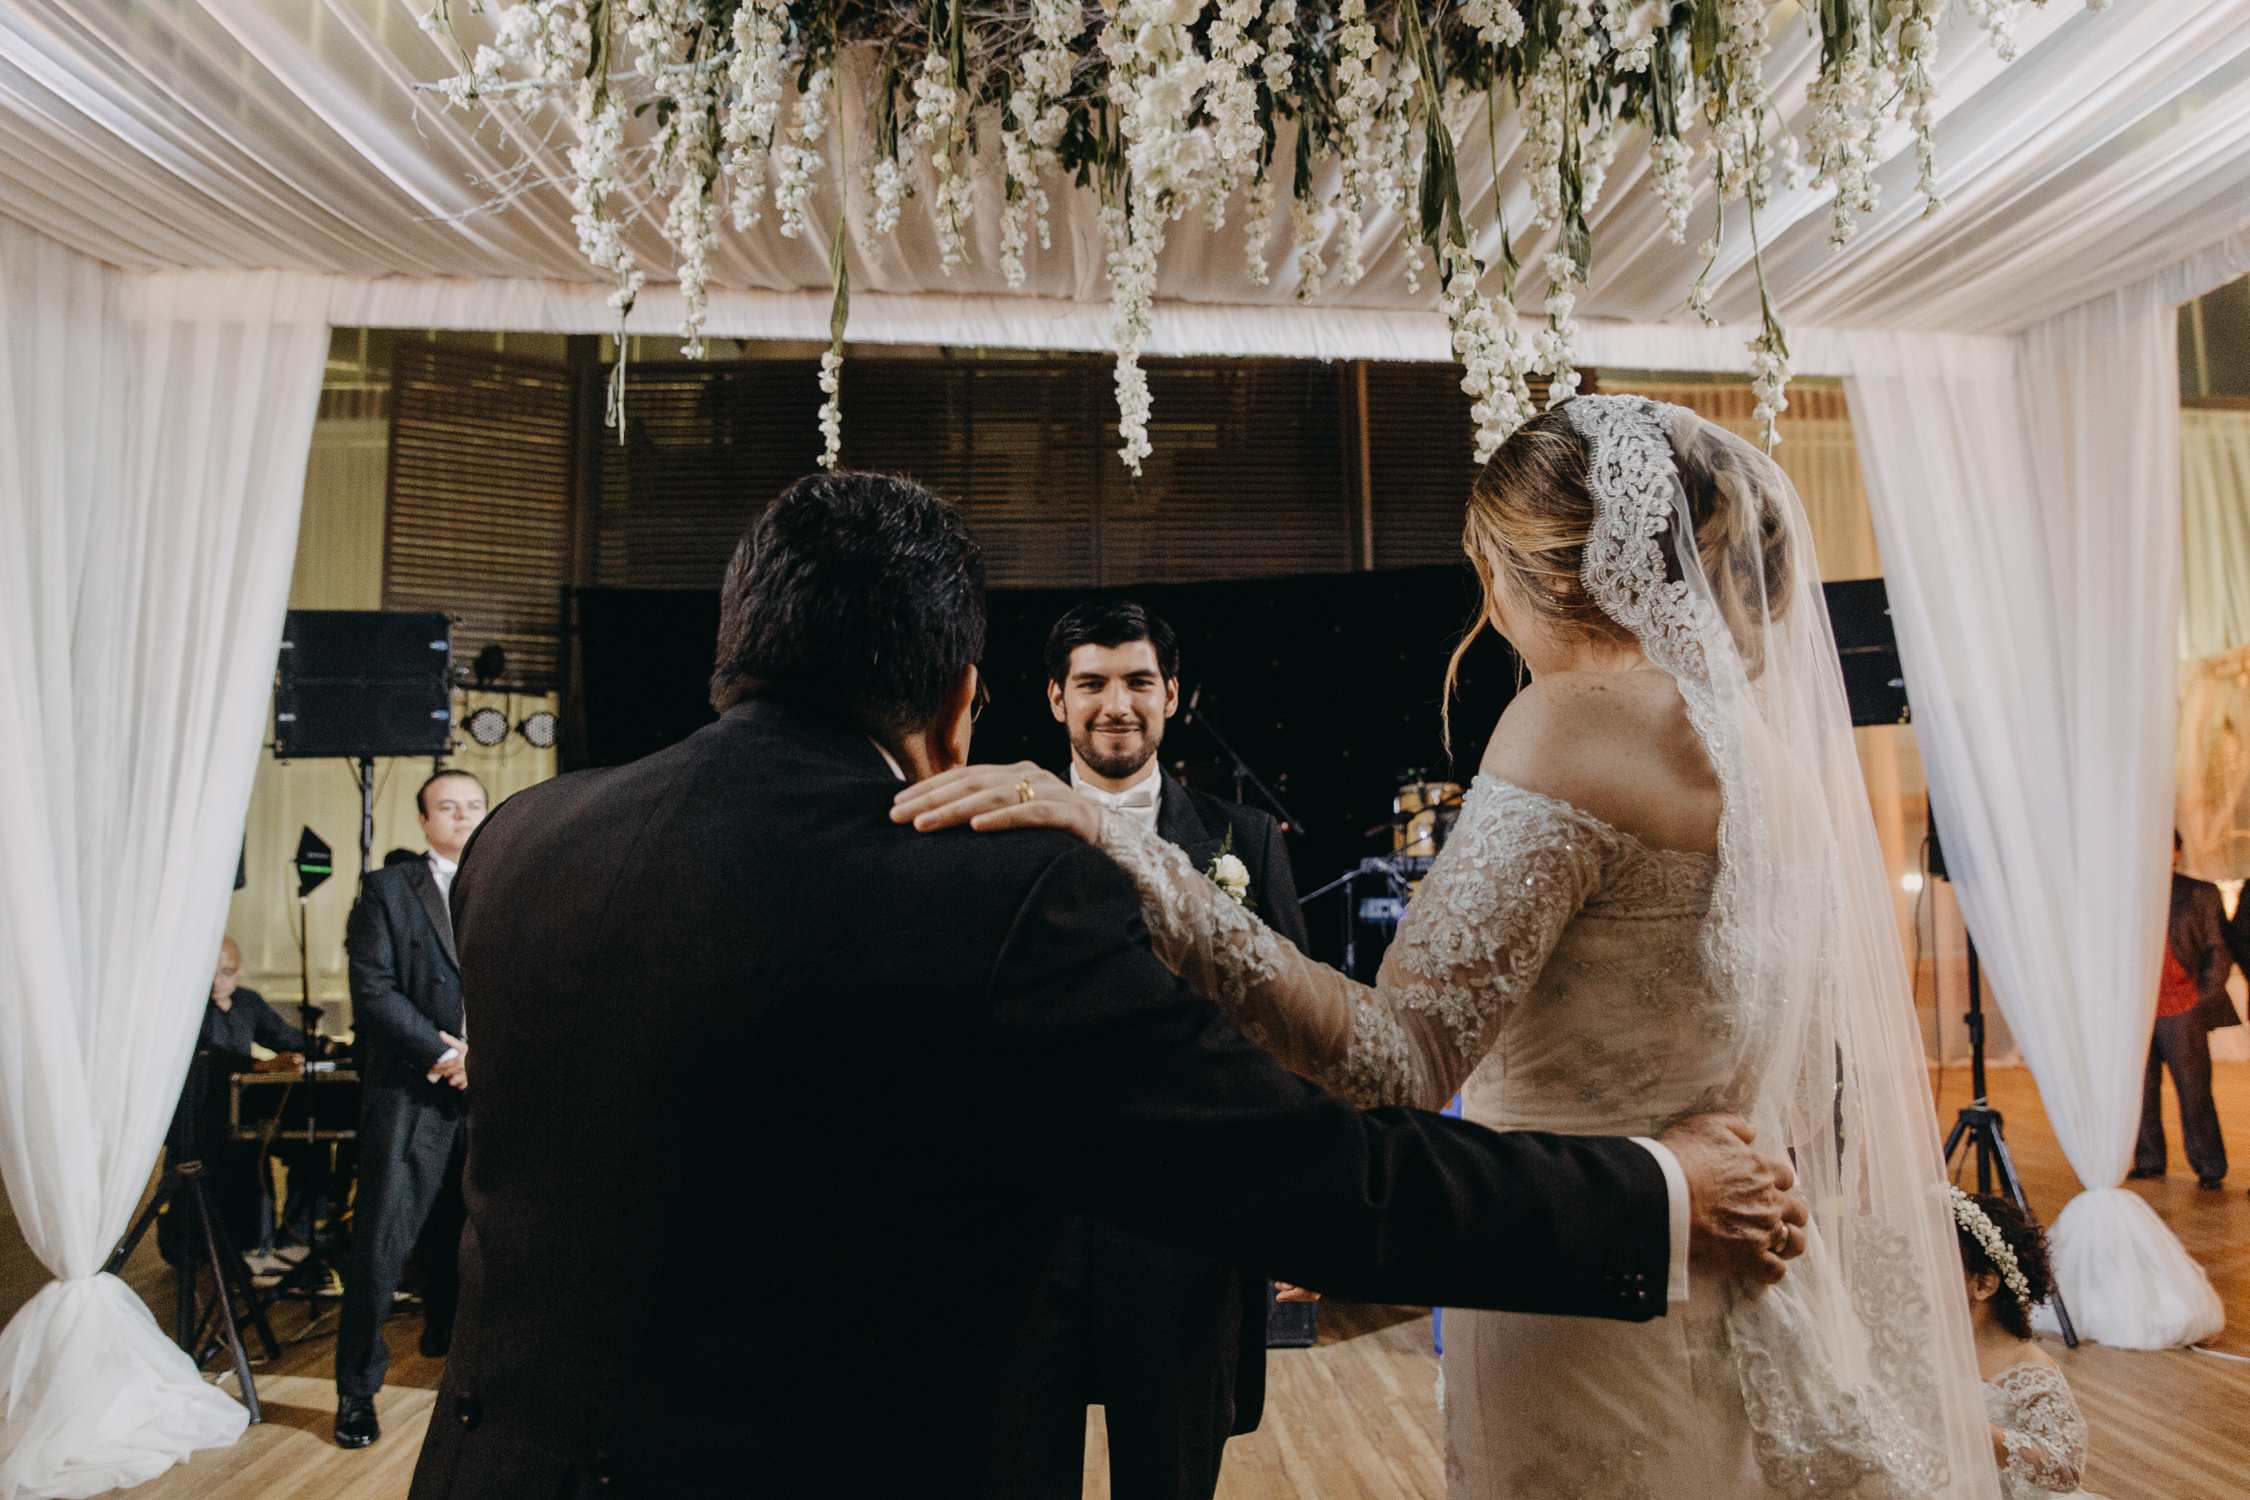 Michelle-Agurto-Fotografia-Bodas-Ecuador-Destination-Wedding-Photographer-Vicky-Javier-140.JPG